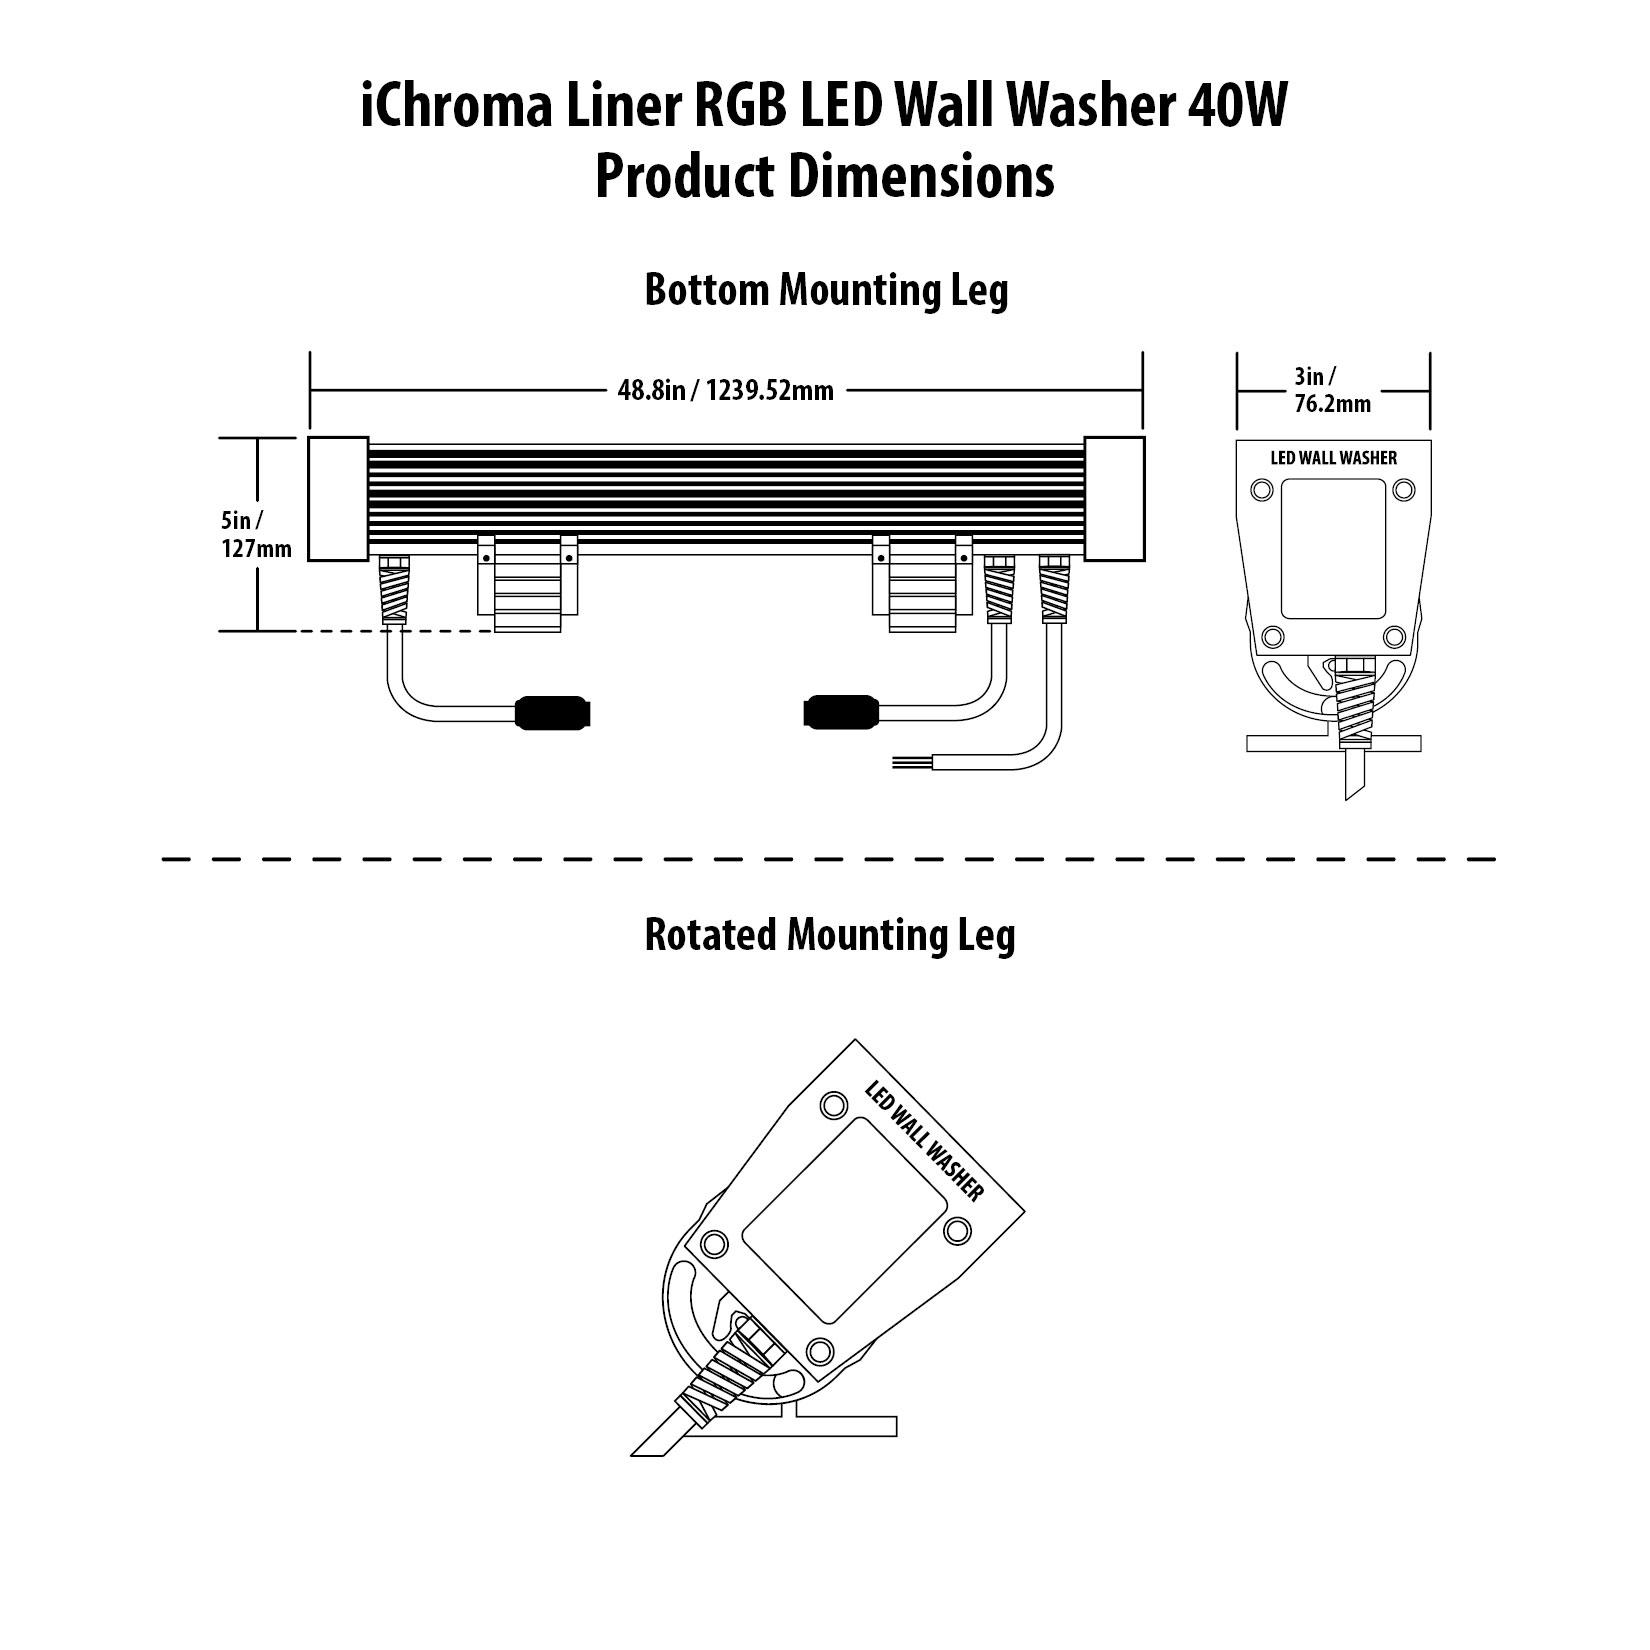 iChroma Liner RGB LED Wall Washer